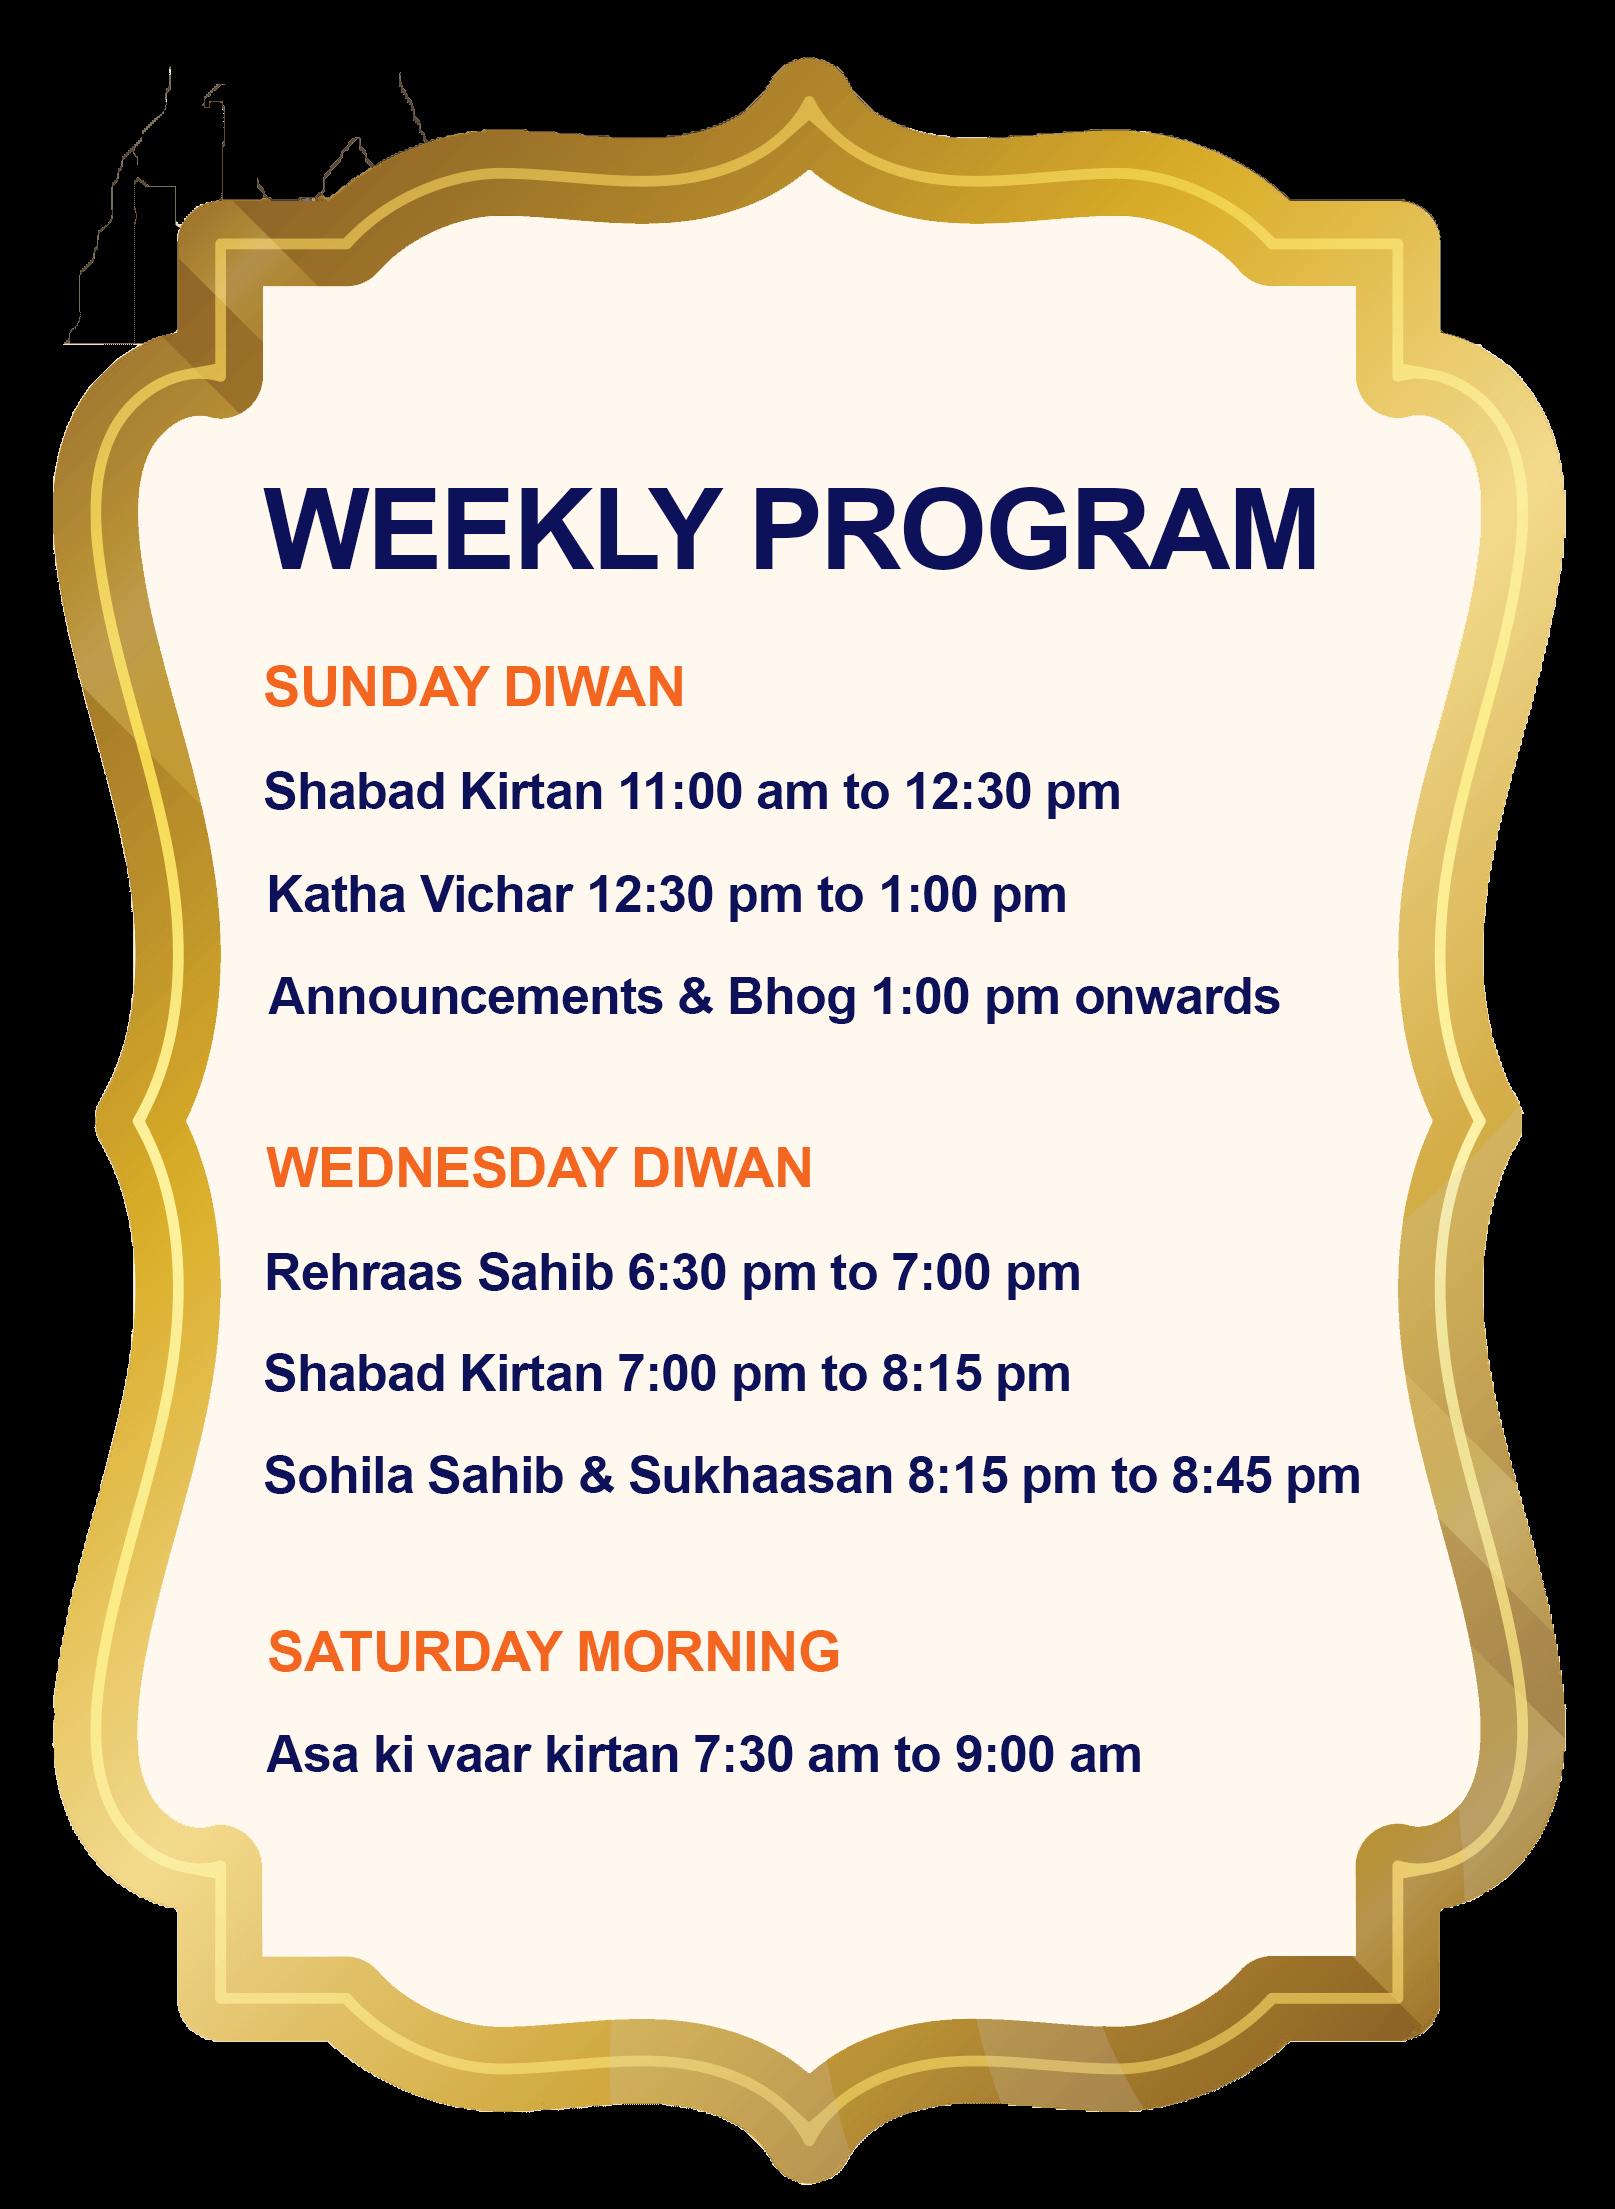 Weekly Programs - Houston Sikh Center